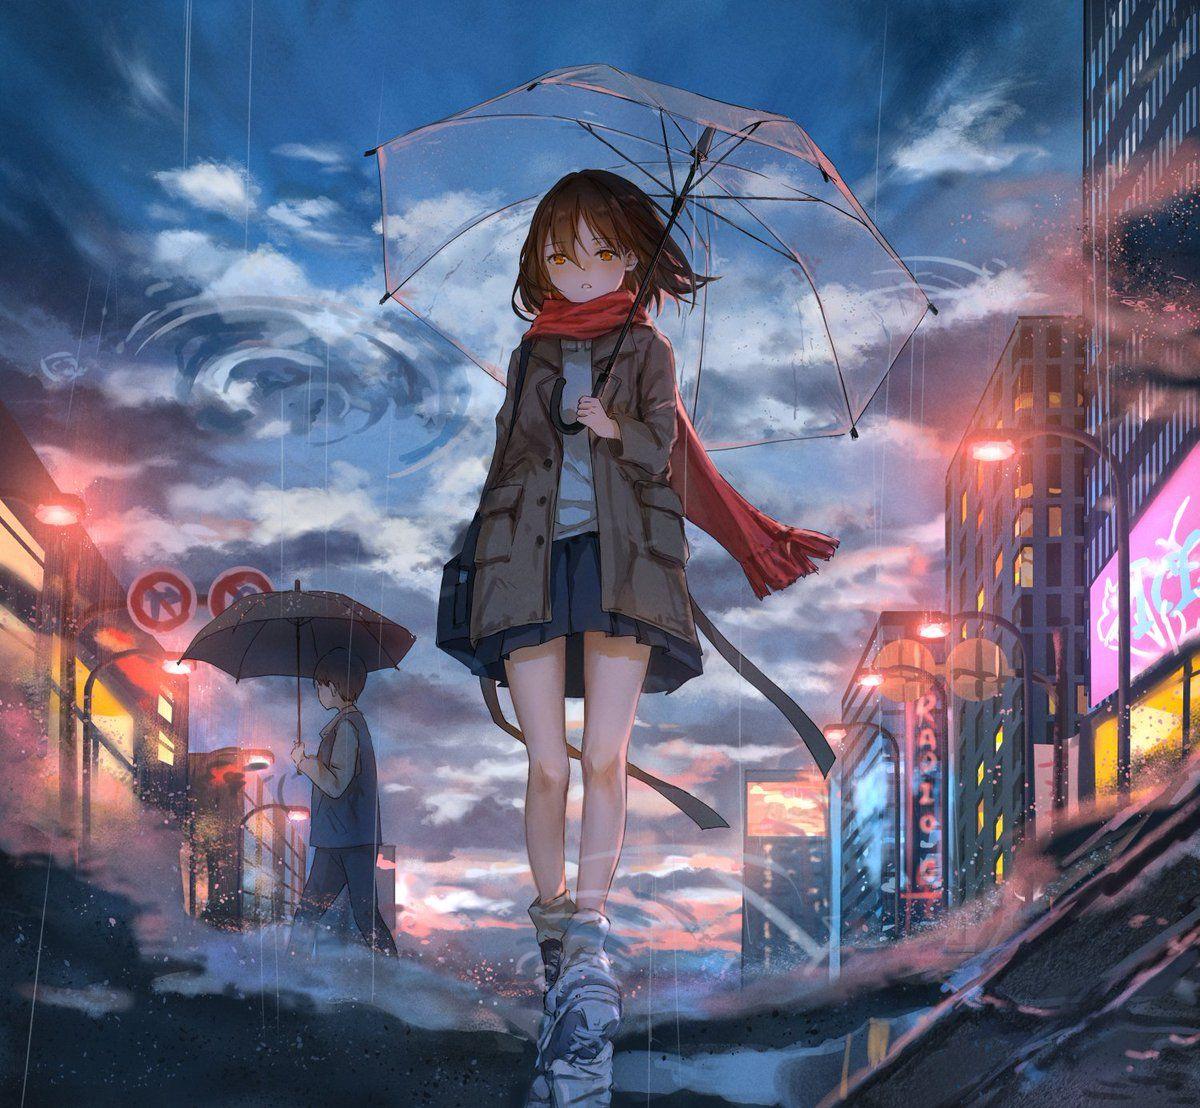 Pin On Love Cute anime portrait wallpaper